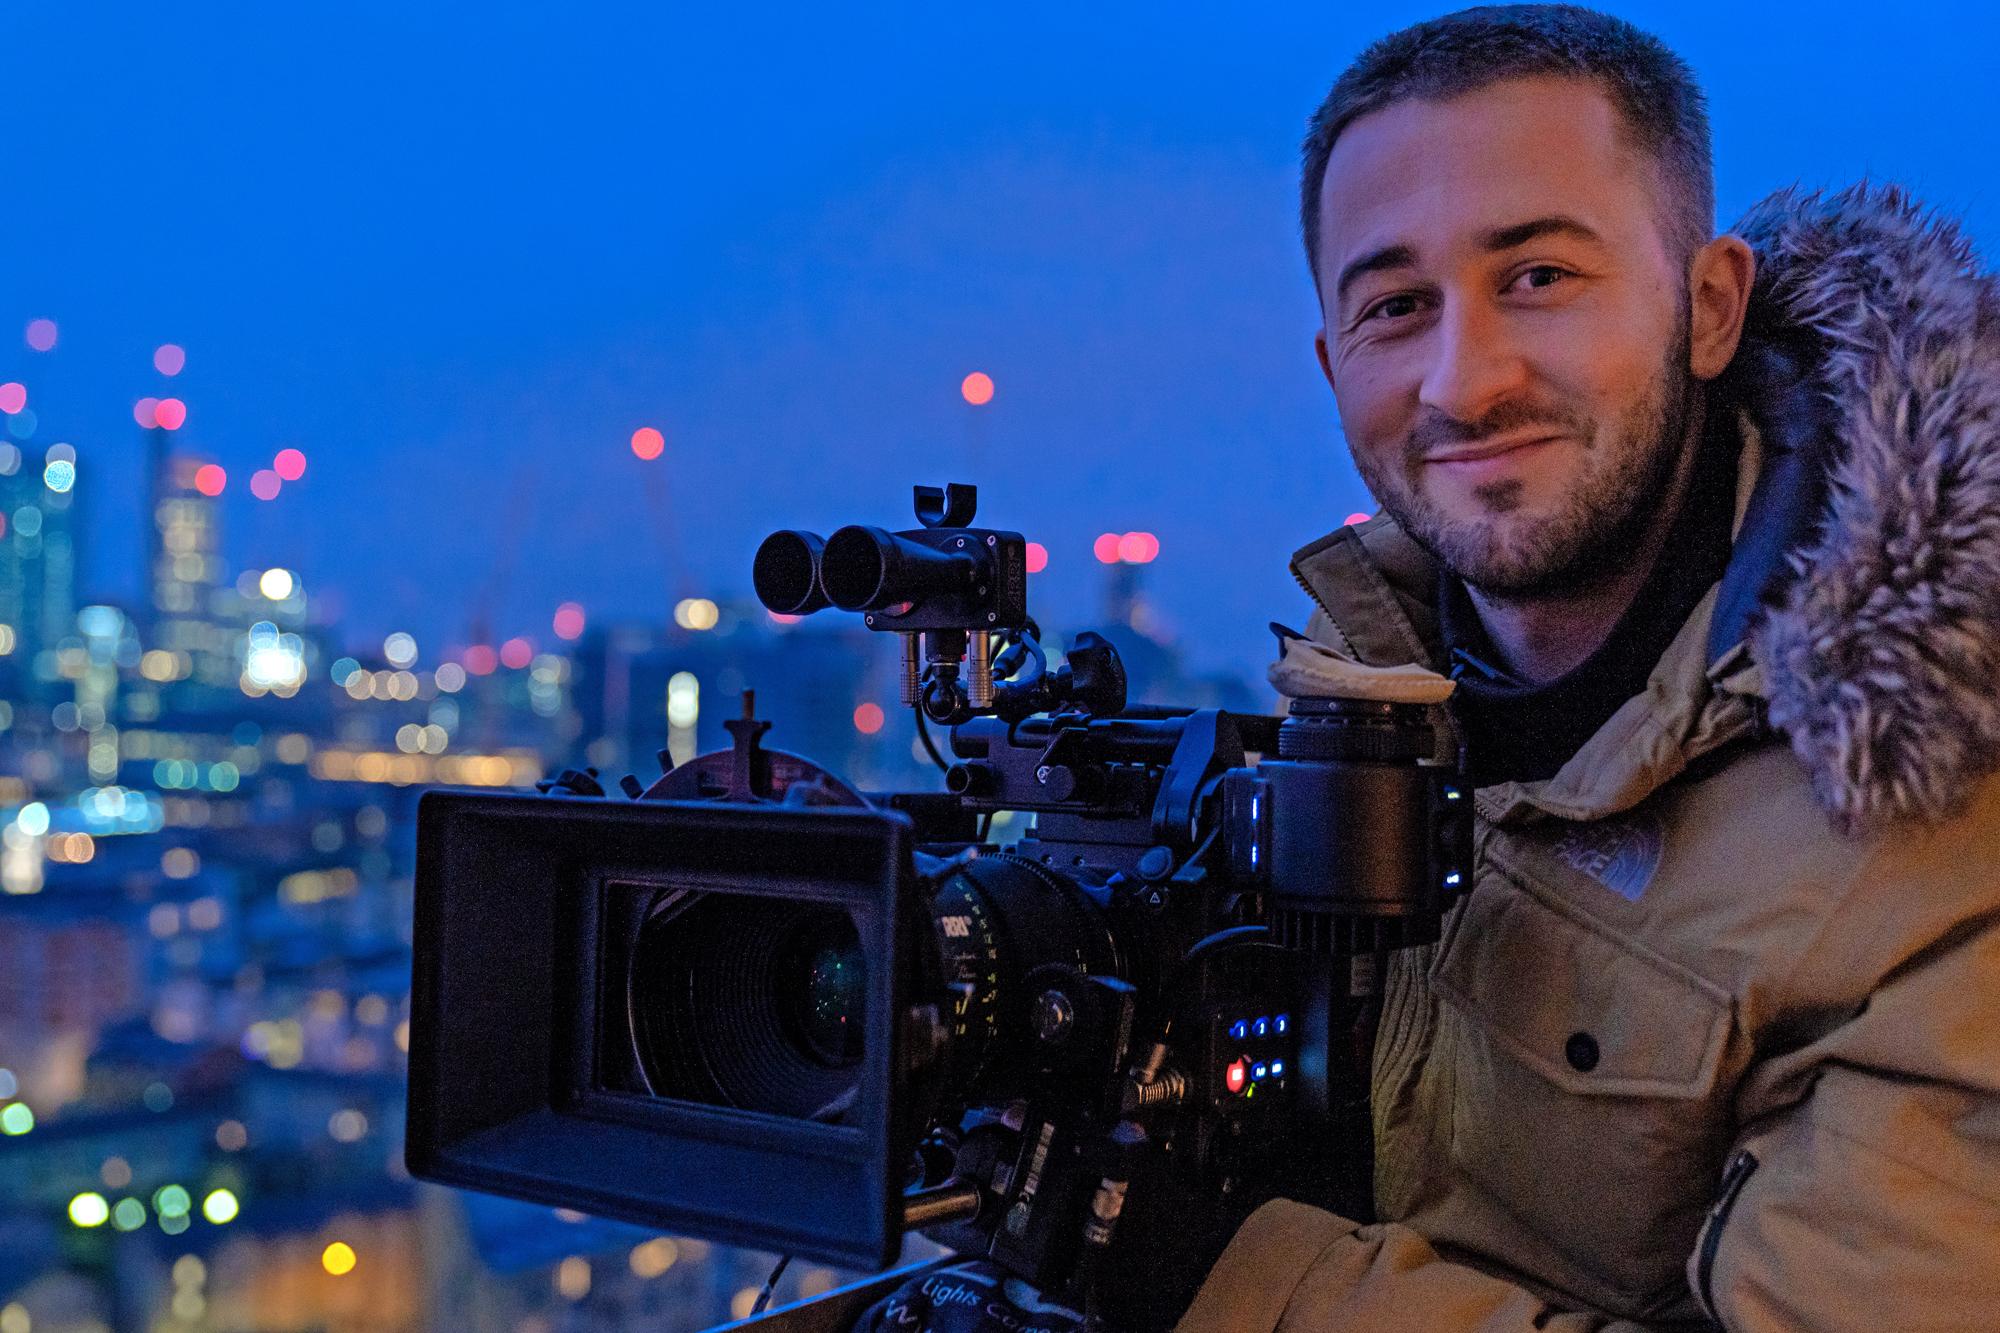 Dan Atherton shooting <em>The Passenger</em> on the Alexa LF